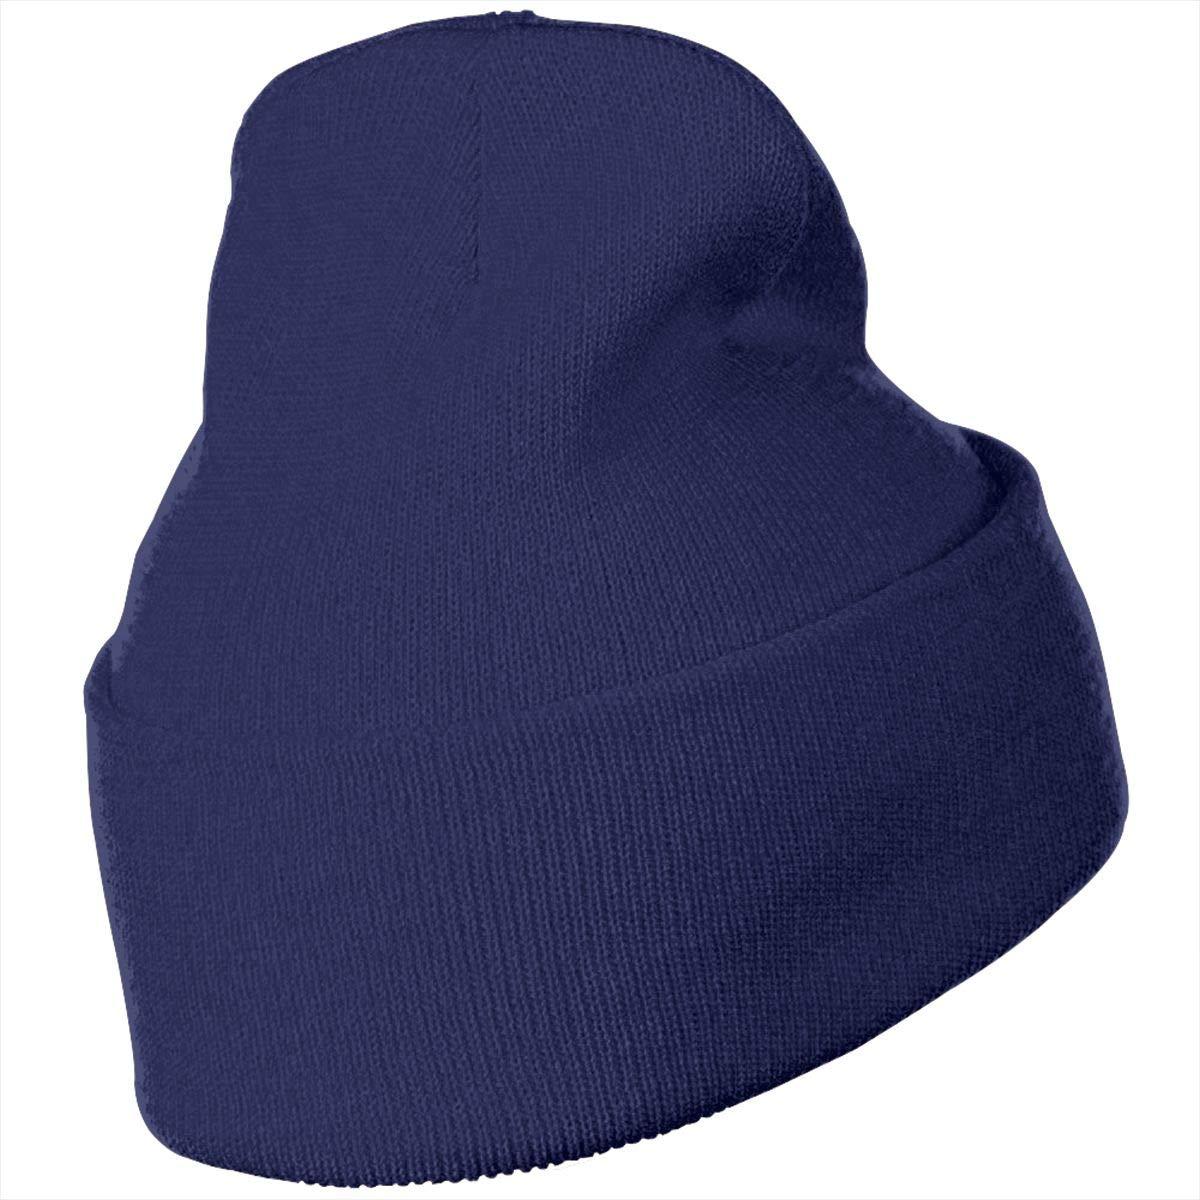 Warm /& Stylish Winter Hats Black Thick MACA Guam Unisex Slouch Beanie Hats